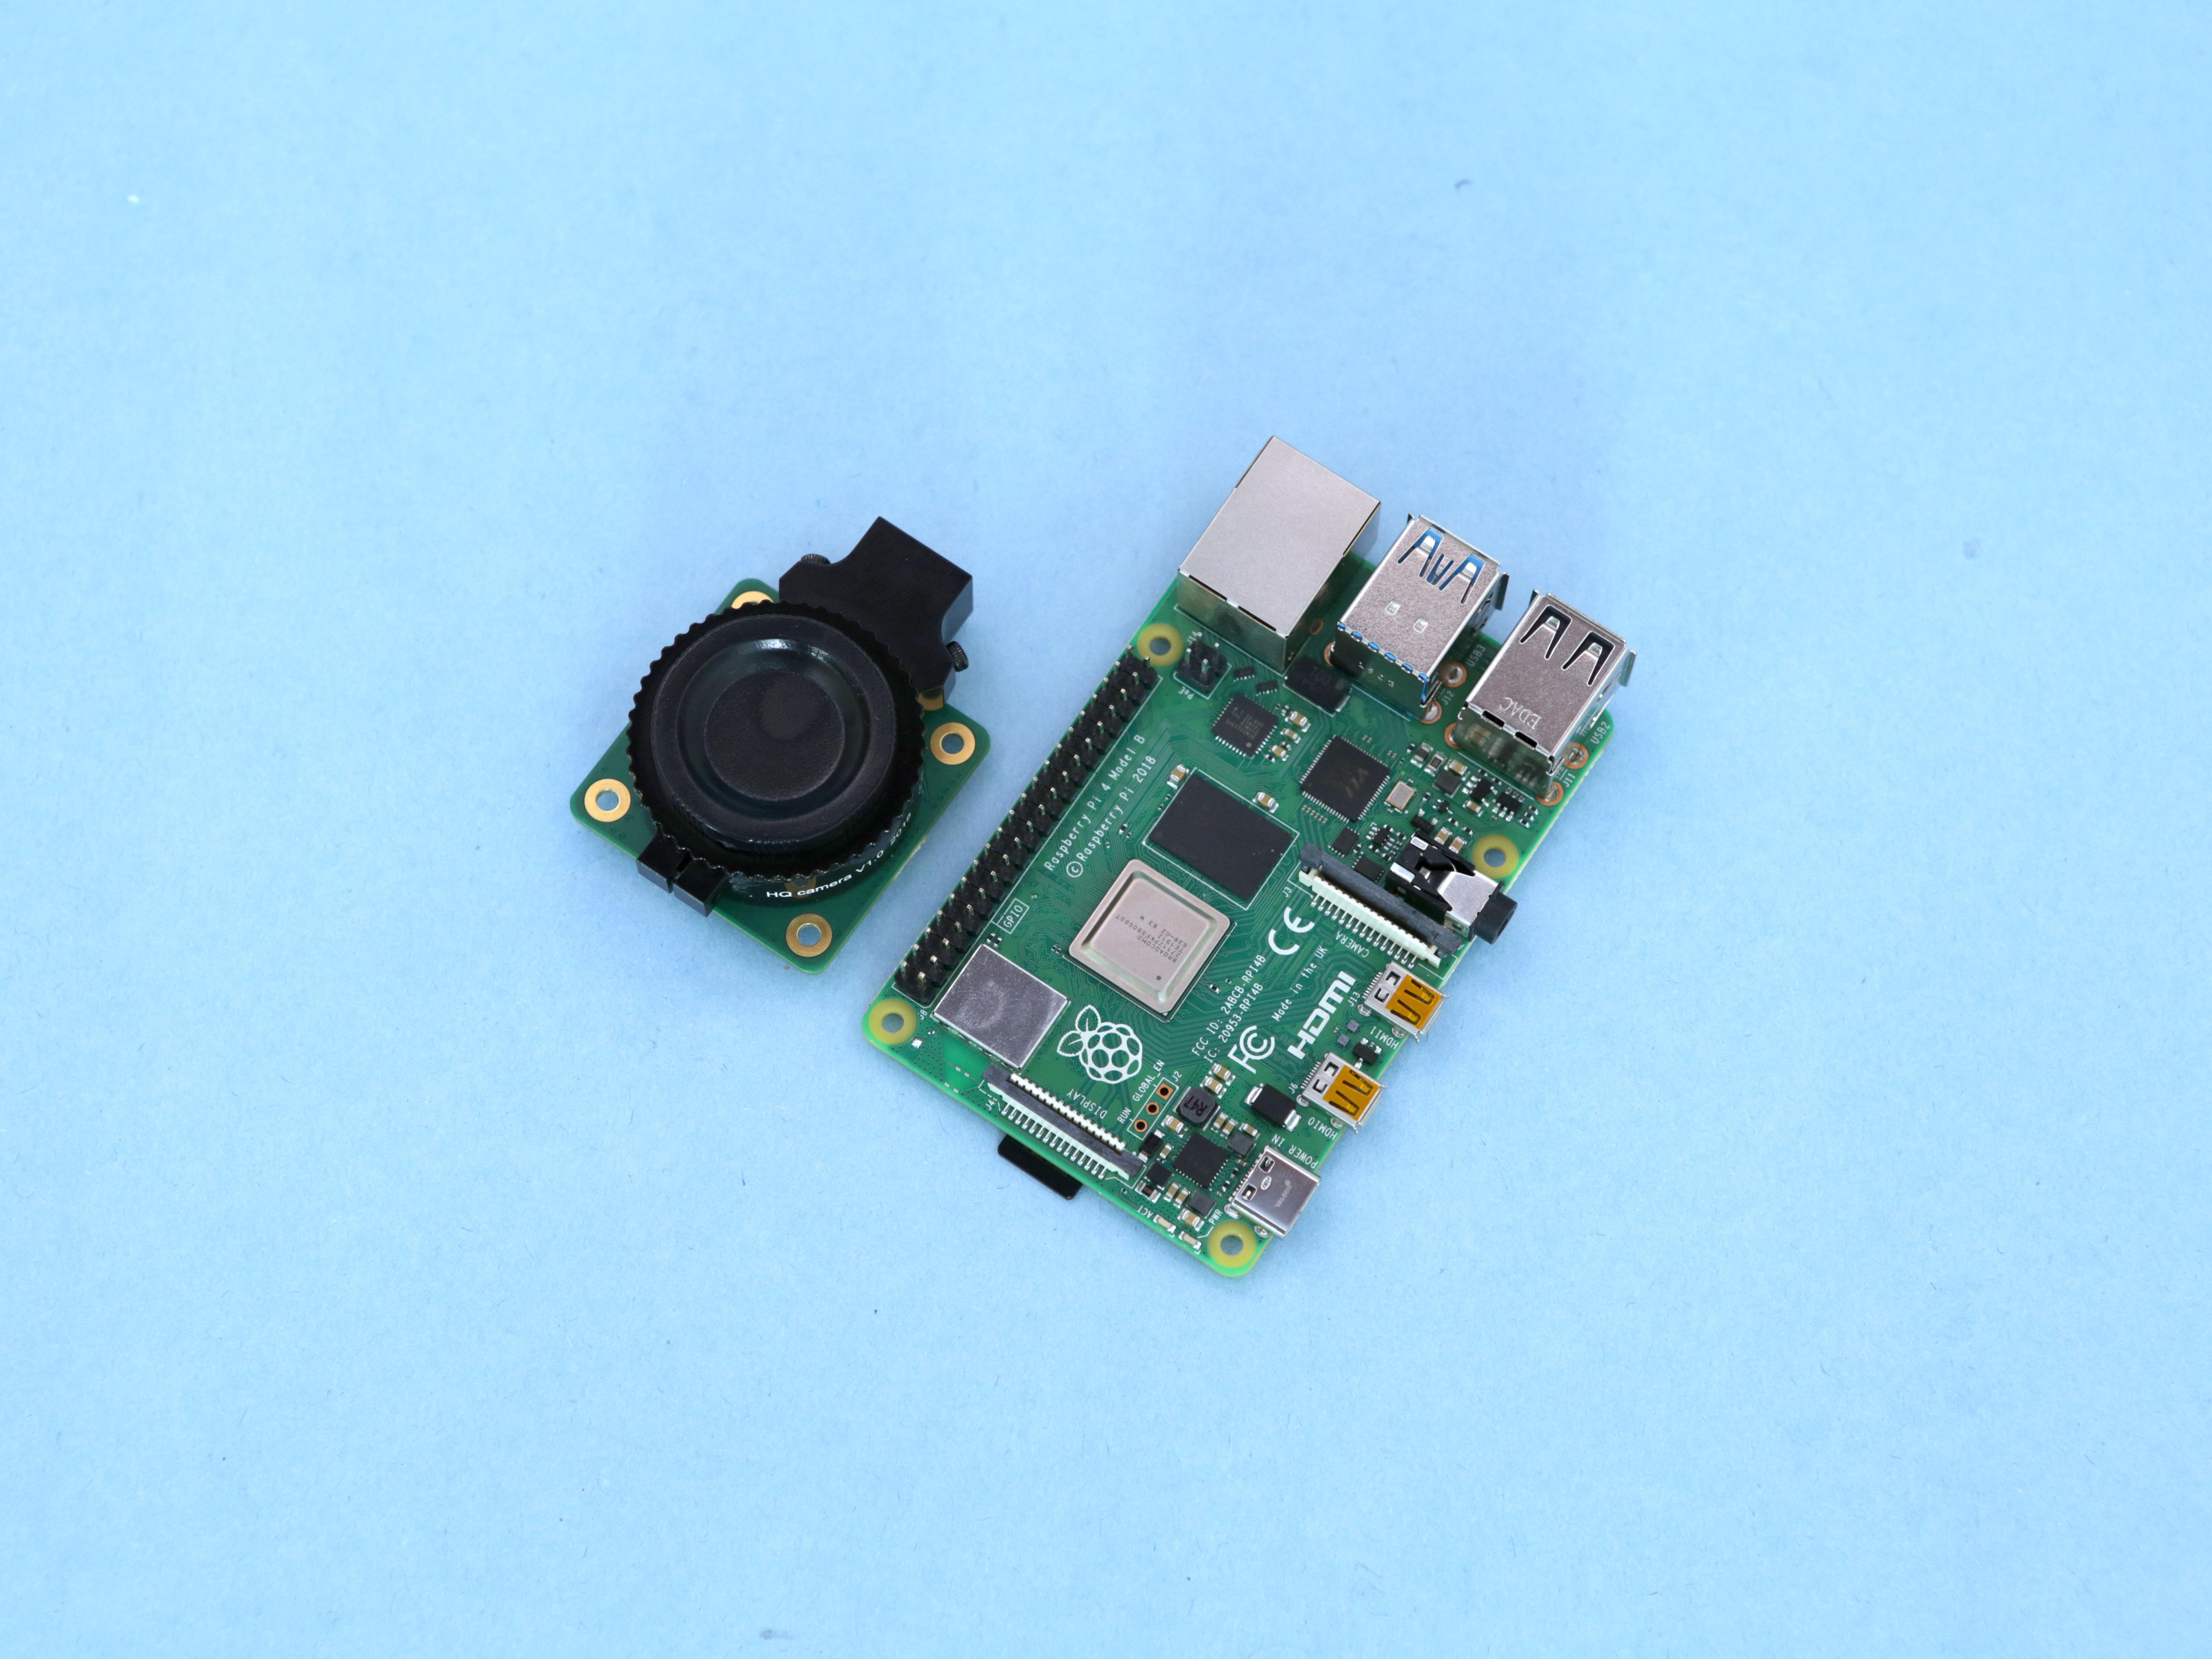 https://learn.adafruit.com/raspberry-pi-hq-camera-case/overview